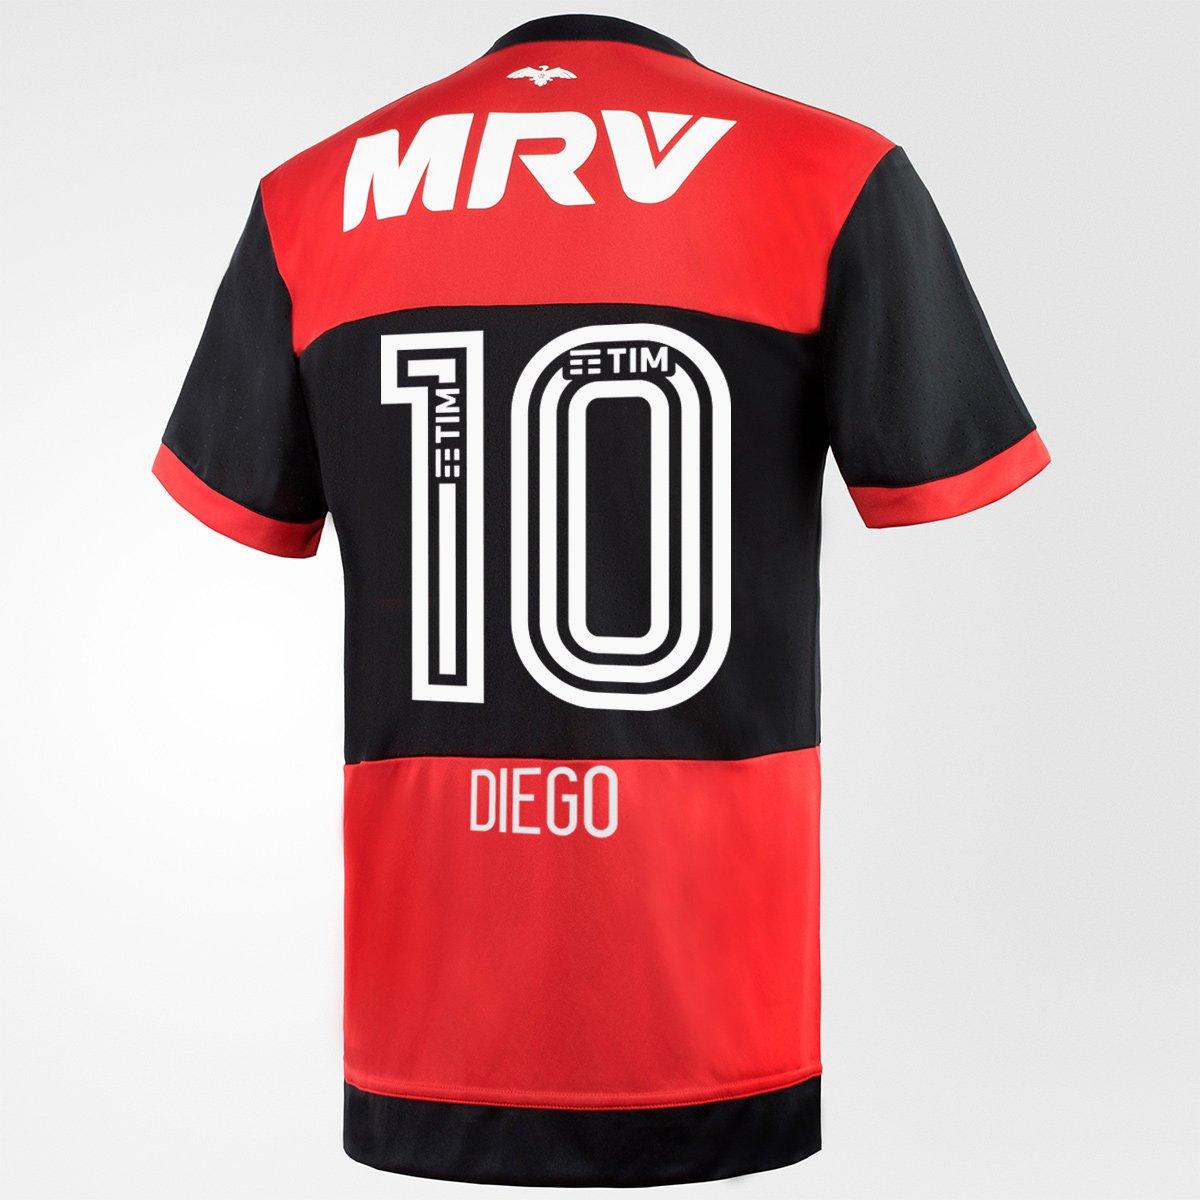 5b5b3ea732 Camisa Flamengo I 17 18 N° 10 - Diego Torcedor Adidas Masculina - Compre  Agora